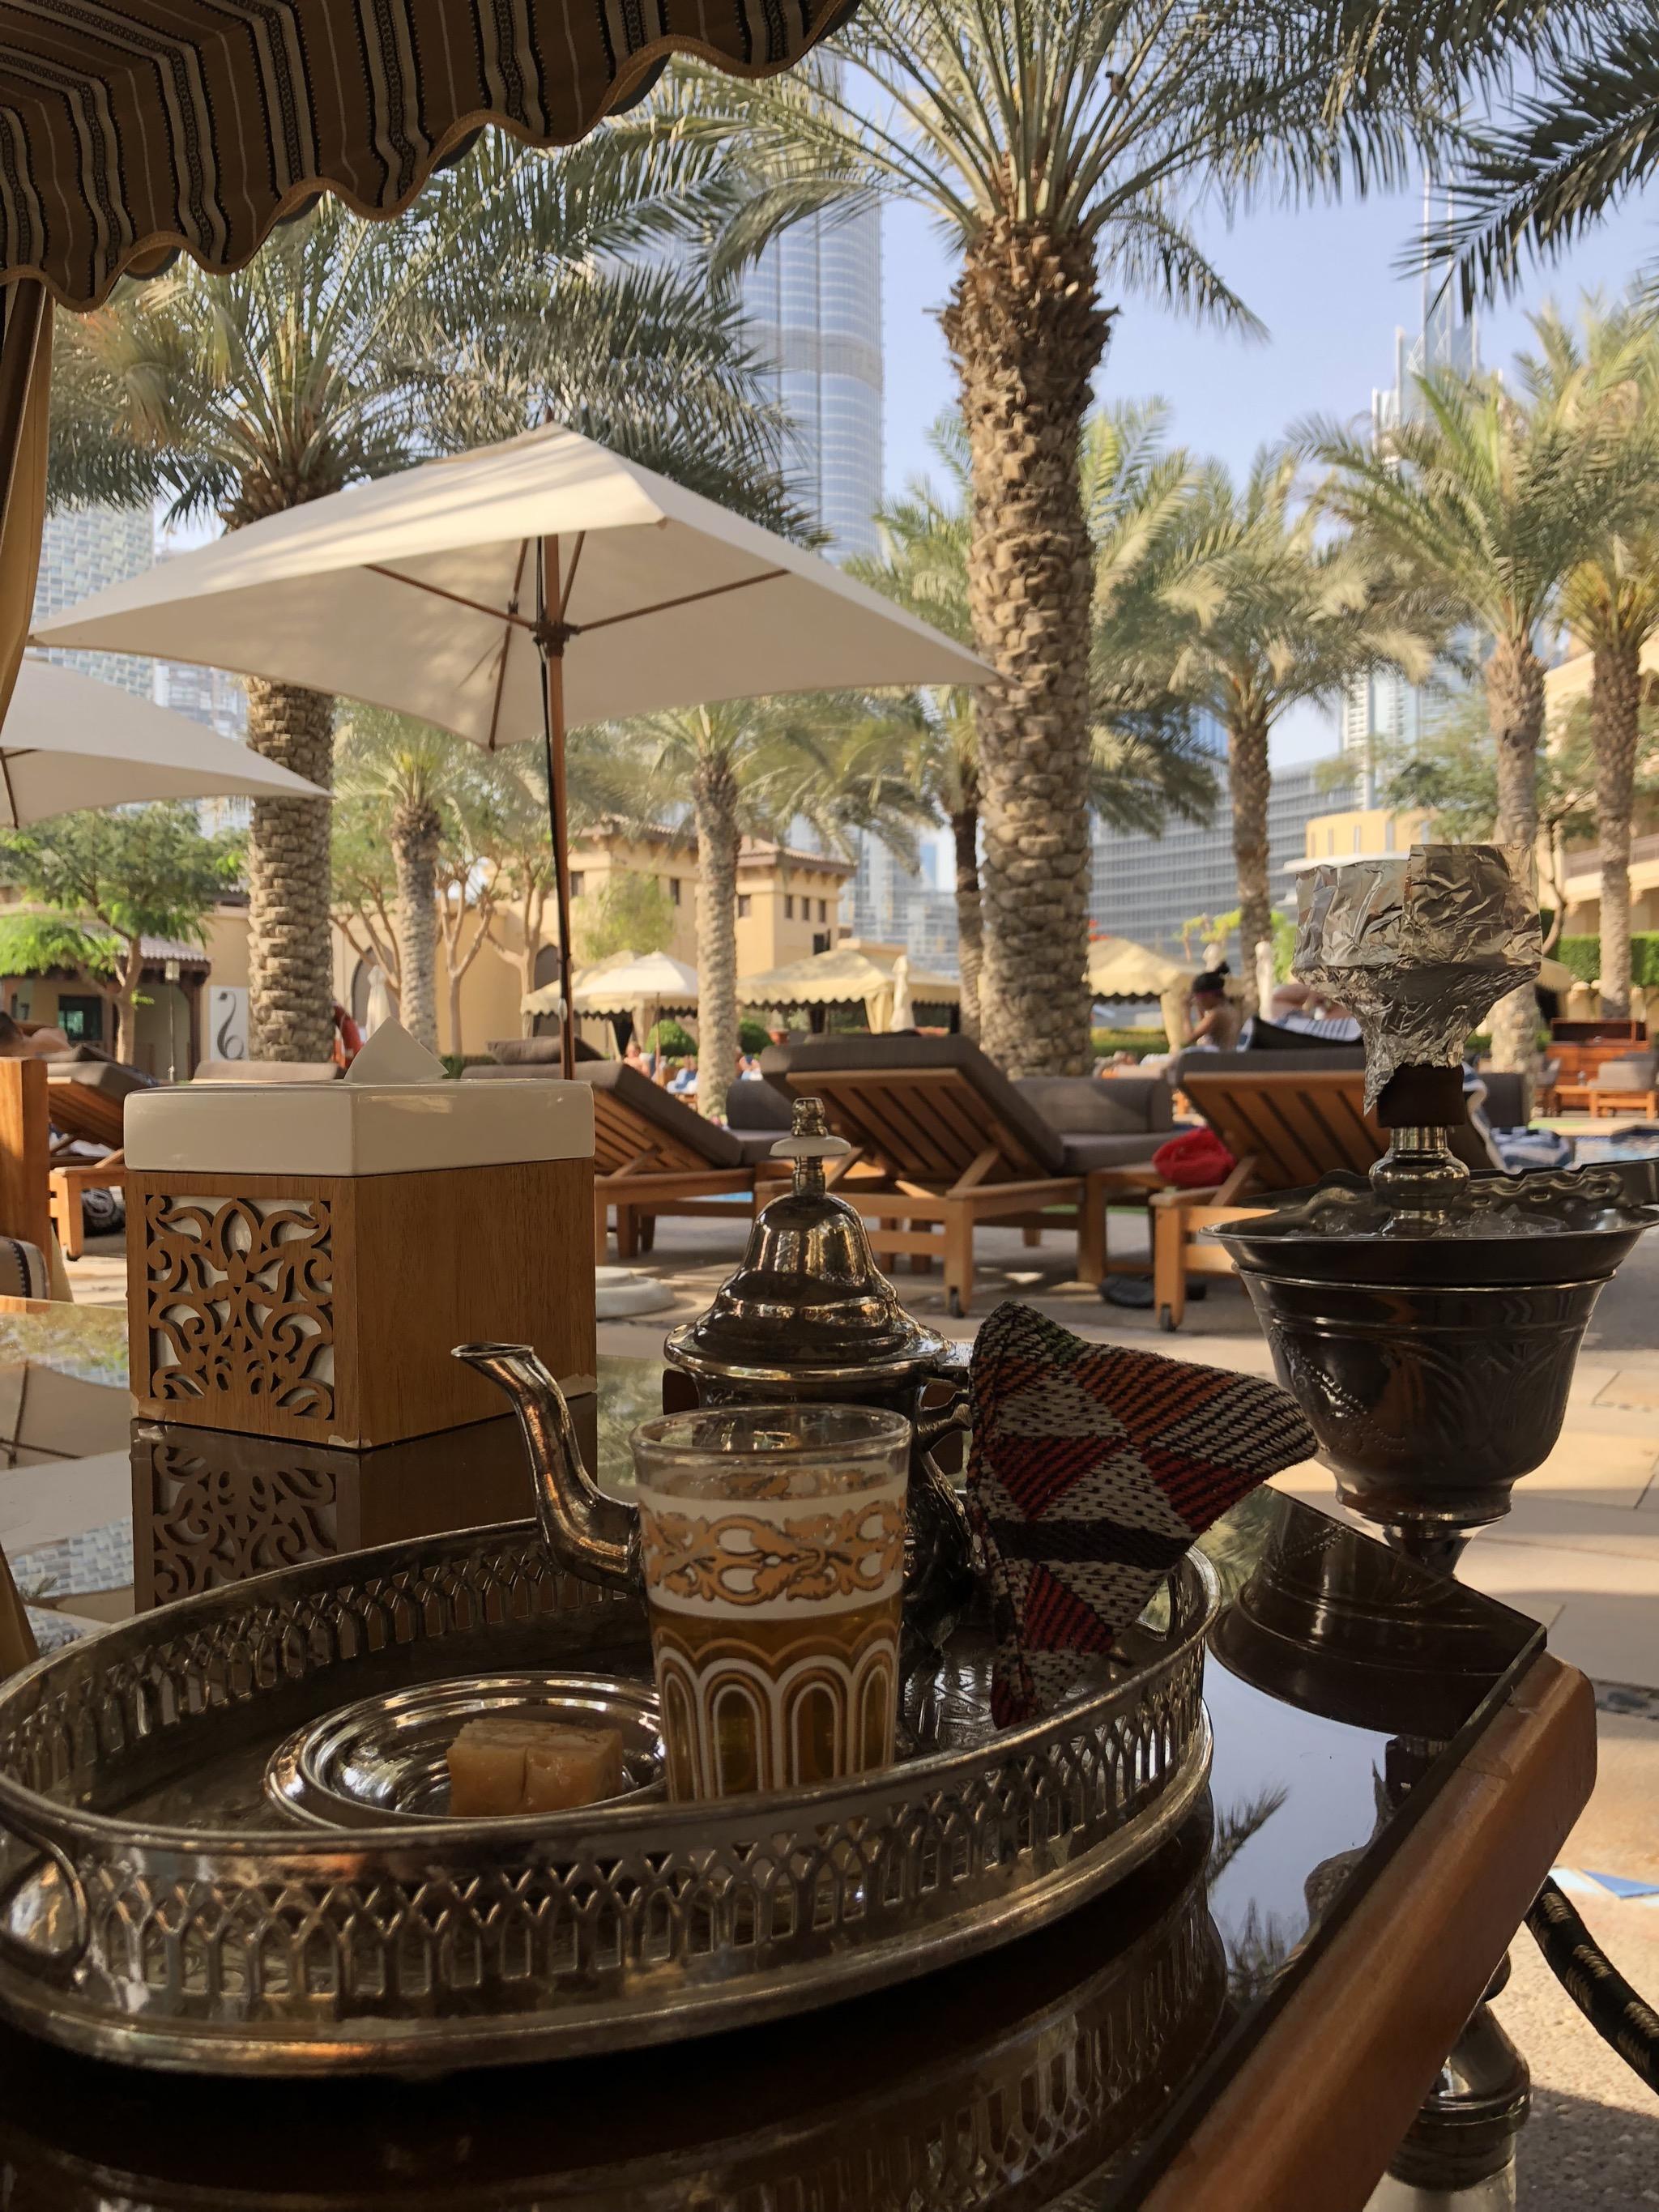 Shisha and Moroccan mint tea - a fine combination